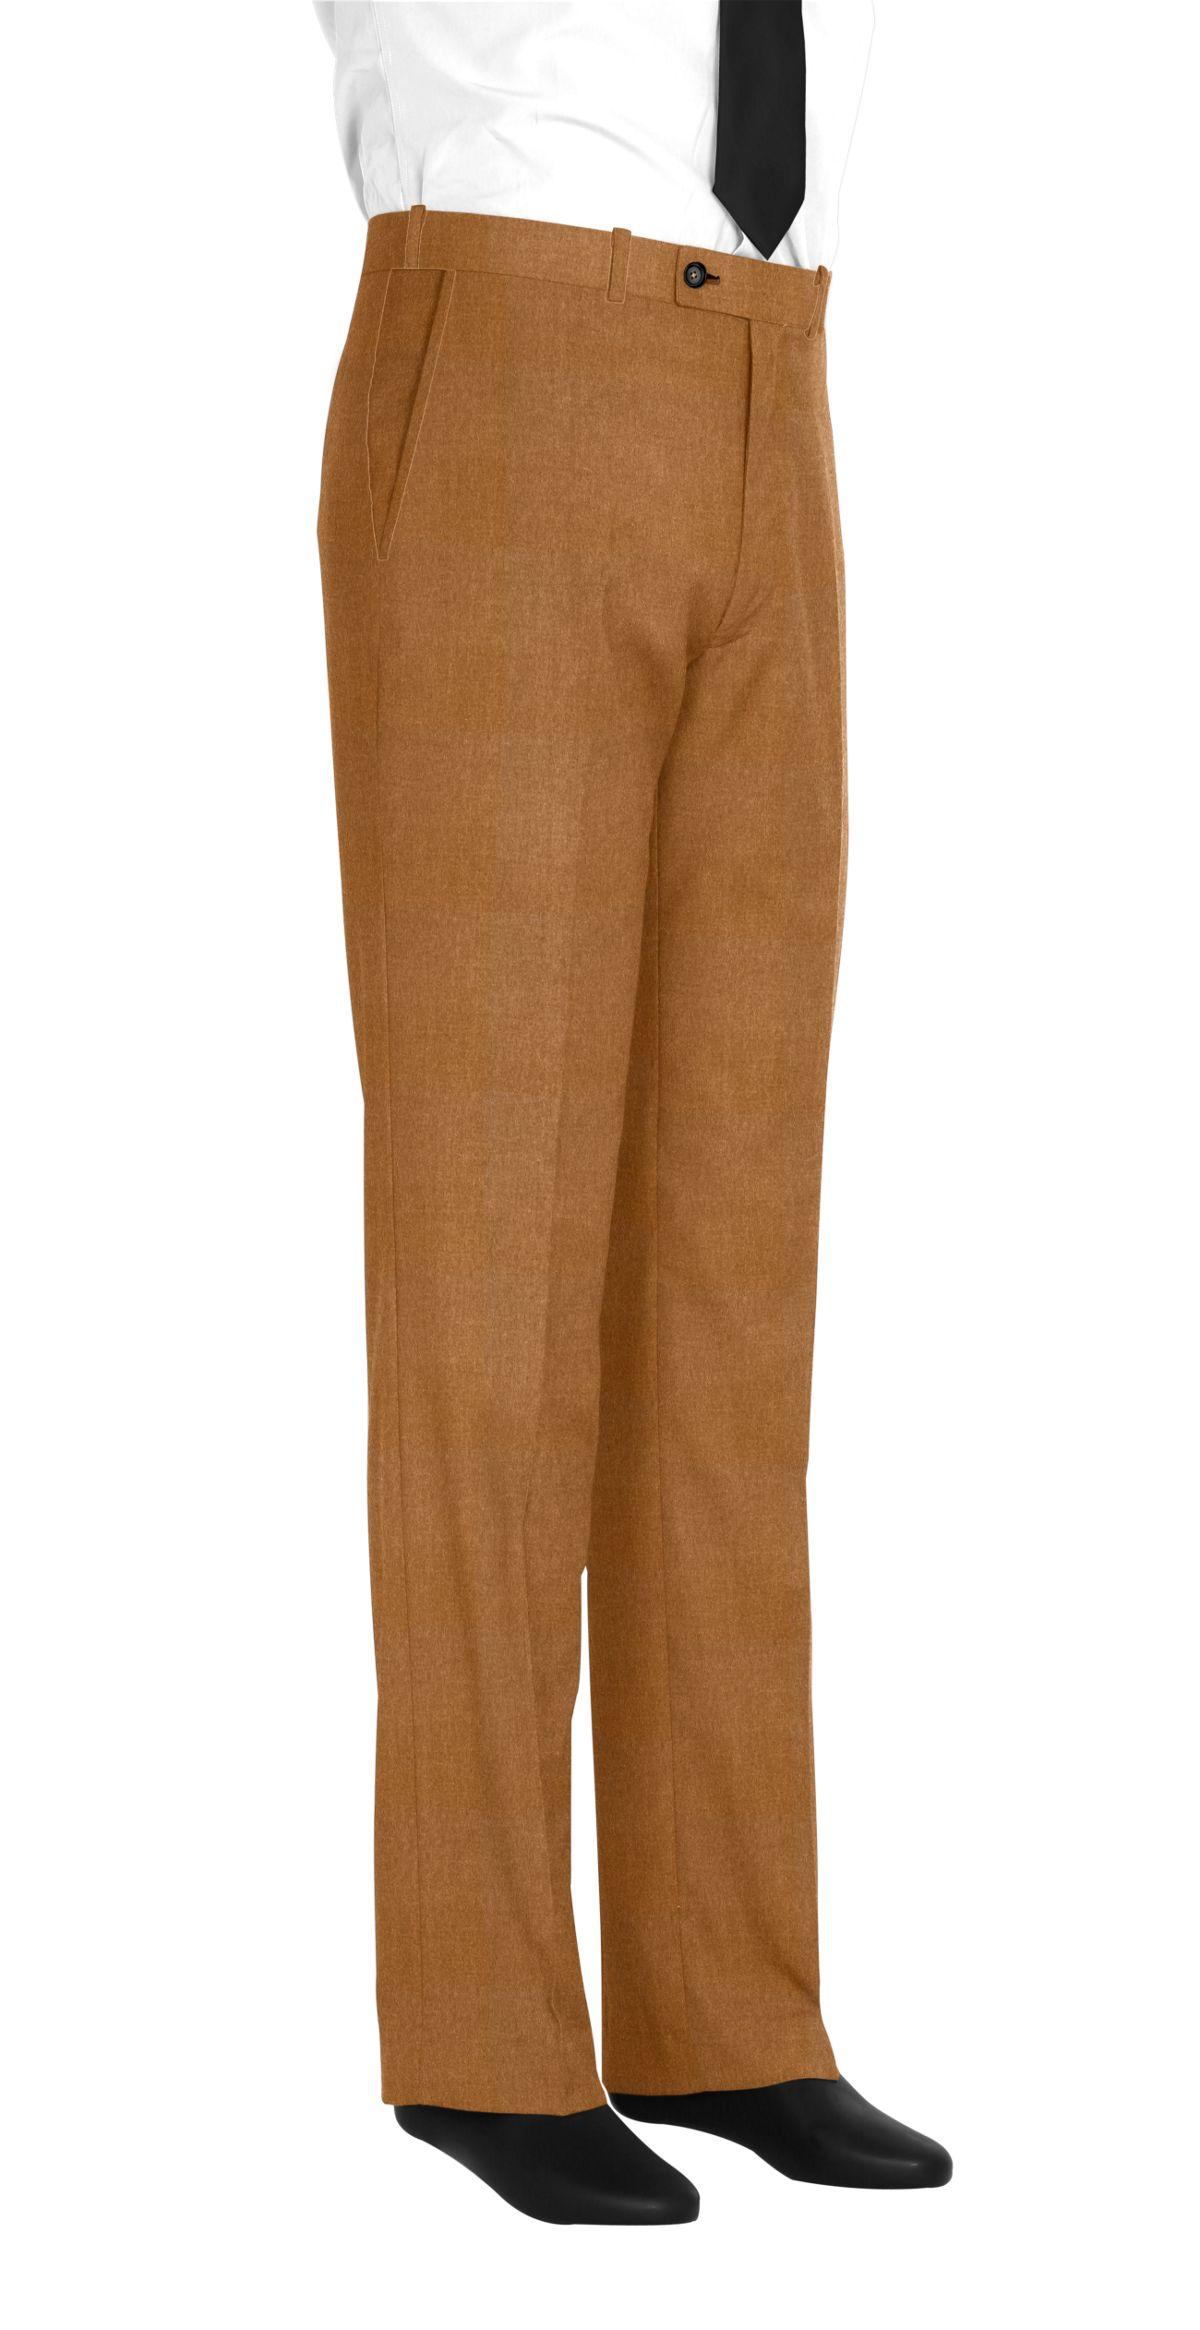 Pantalon beige pan de velours